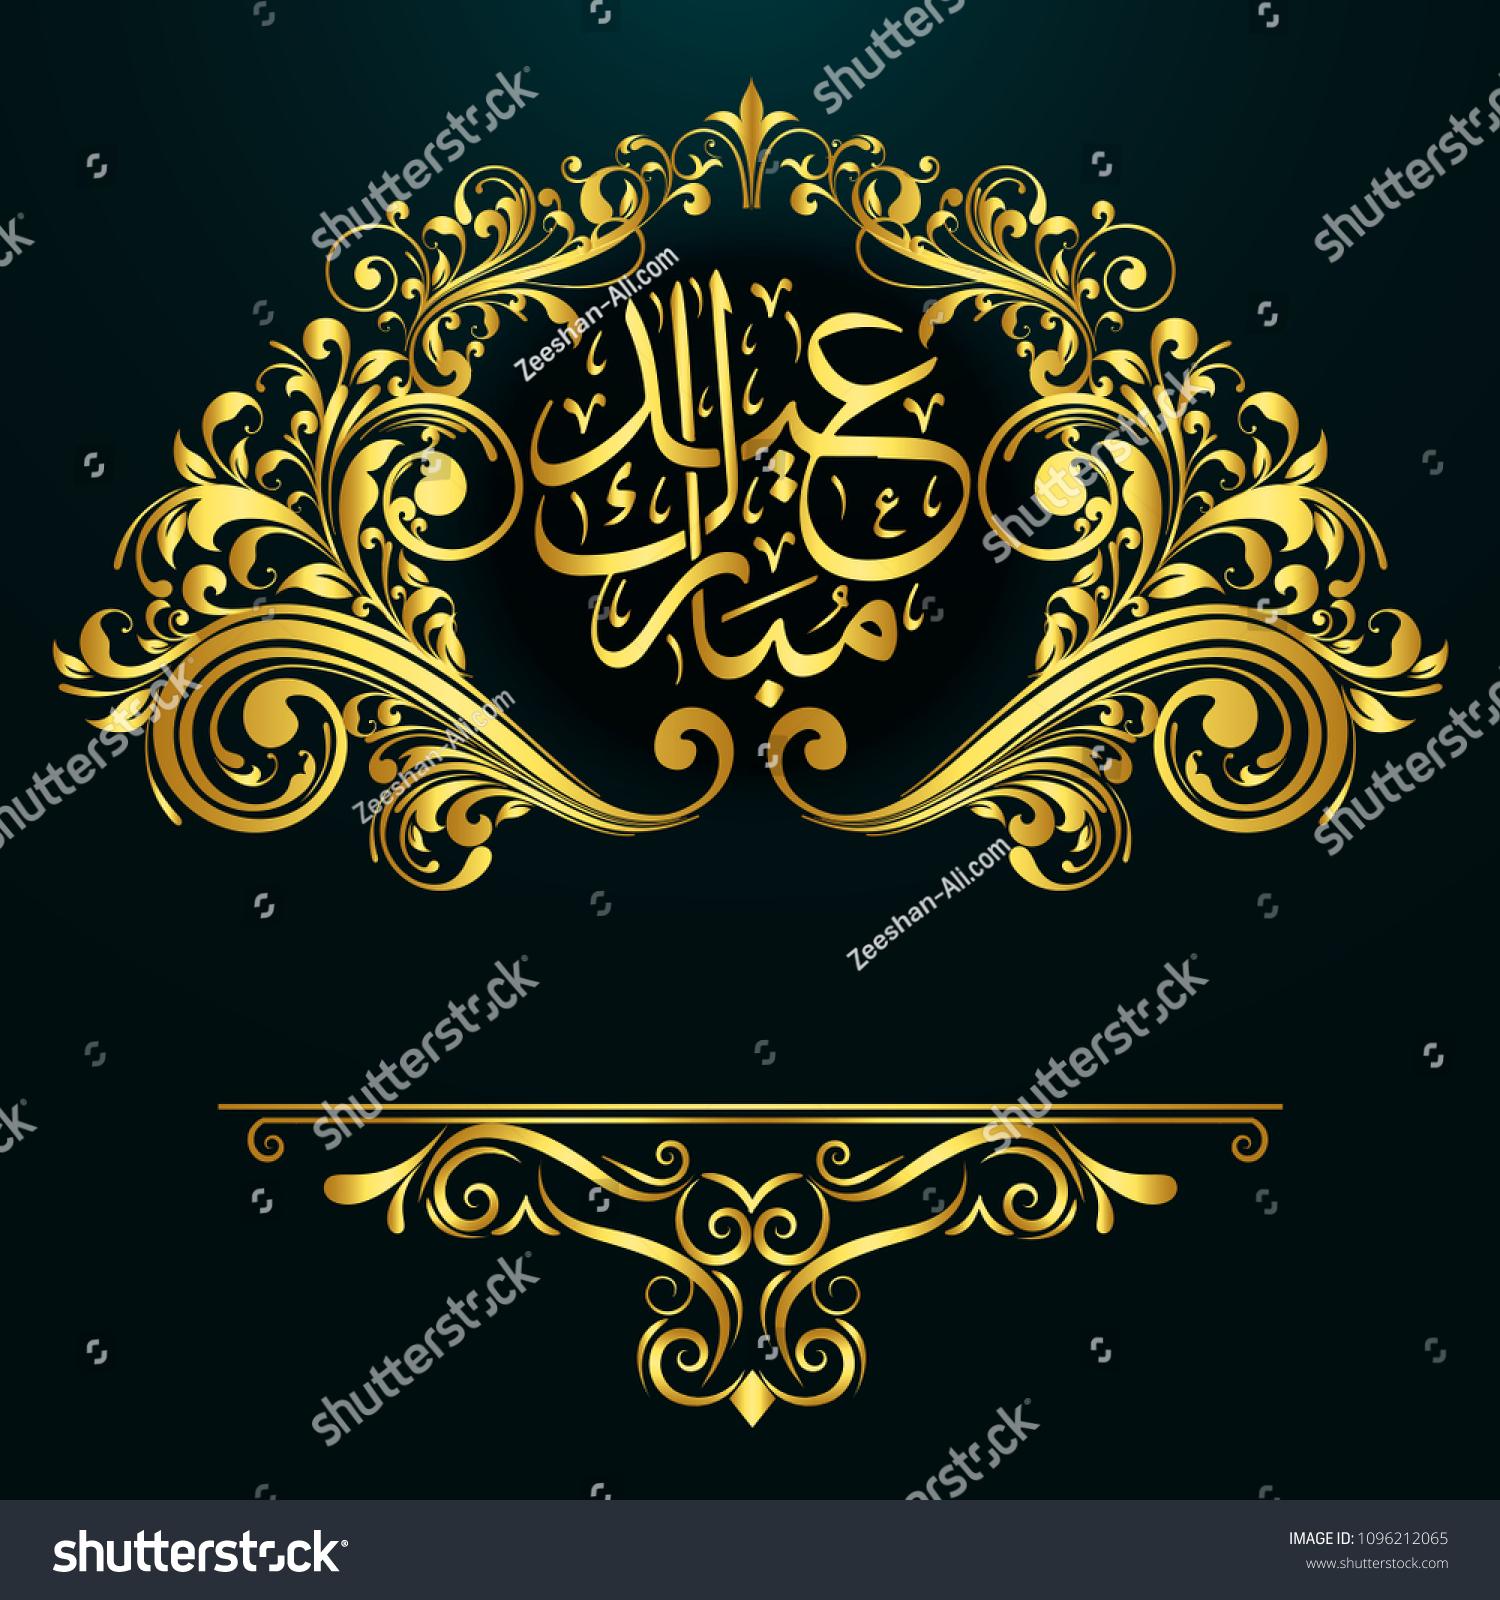 Islamic Design Stating Eid Mubarak Arabic Stock Vector 1096212065